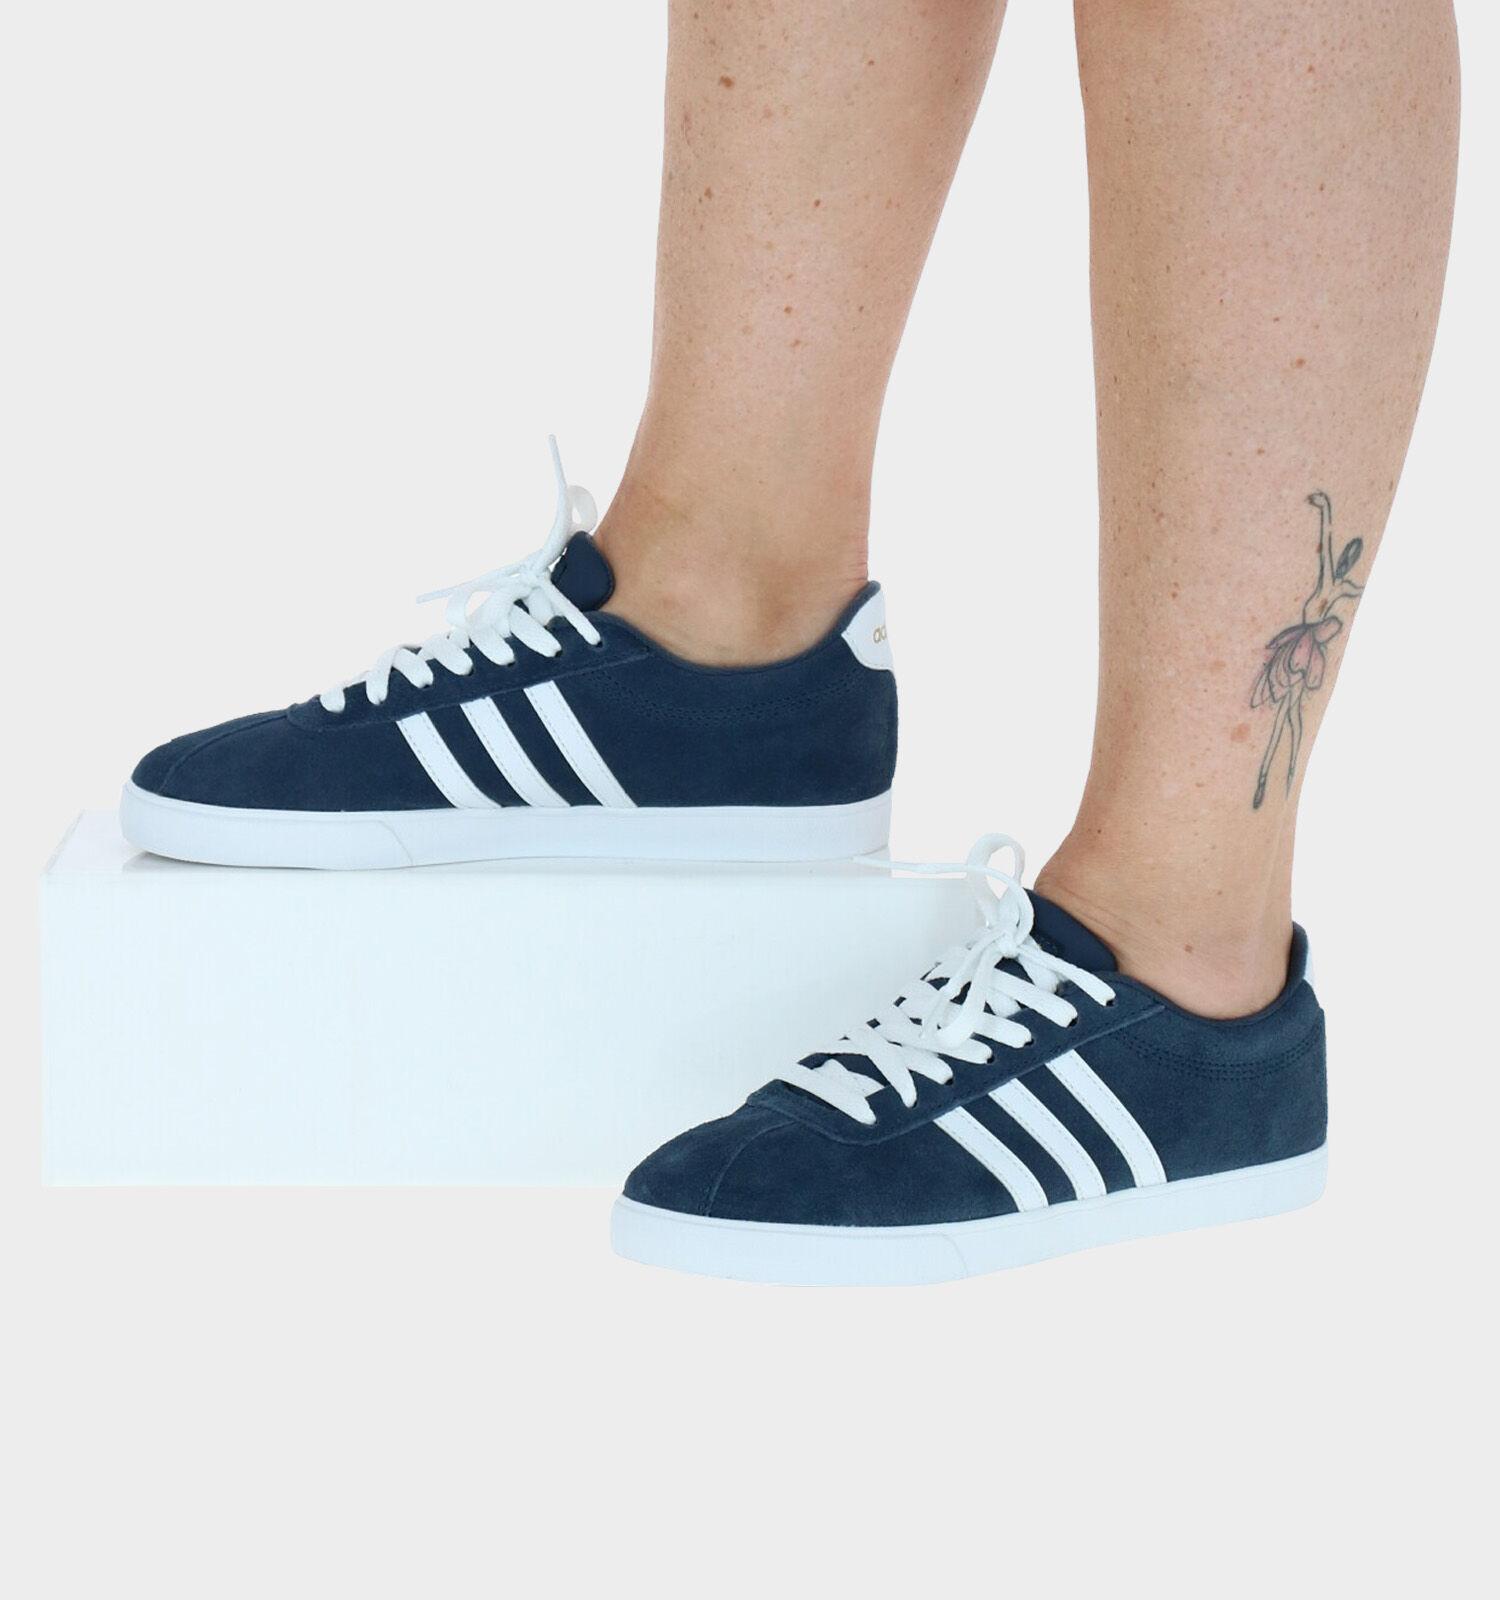 adidas Courtset Blauwe Sneakers